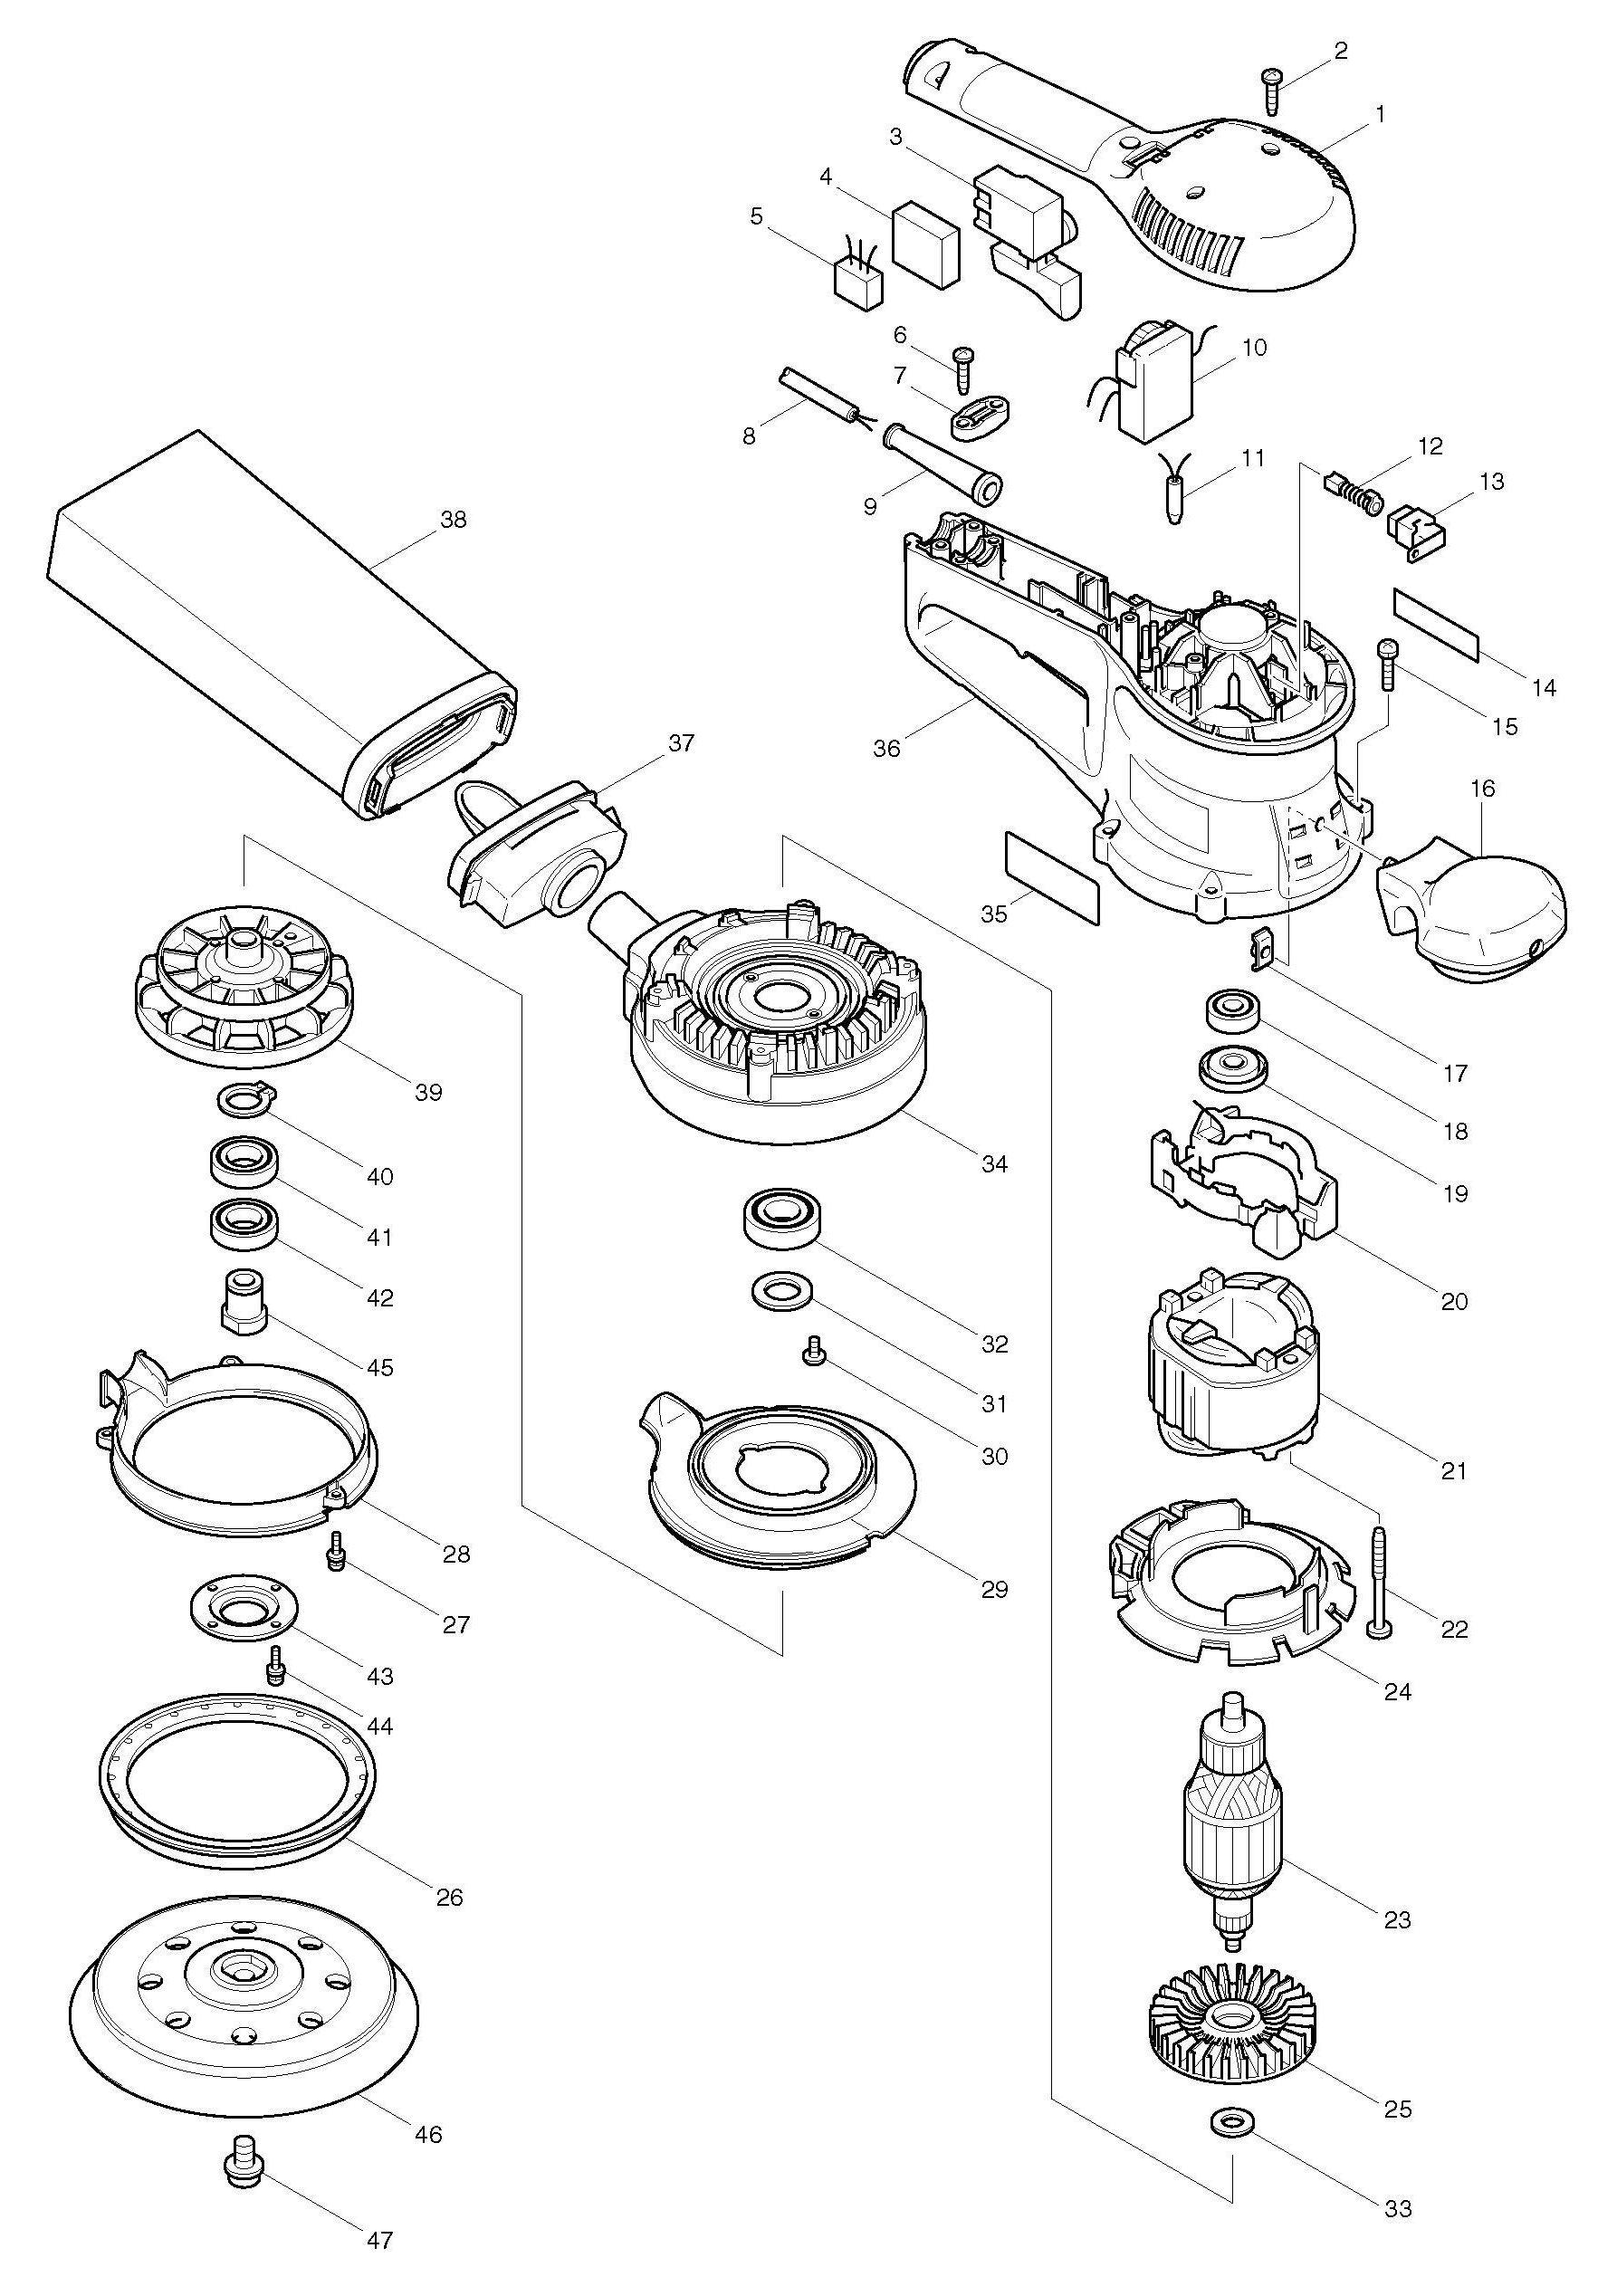 spares for makita bo6030 random orbit sander 150mm. Black Bedroom Furniture Sets. Home Design Ideas